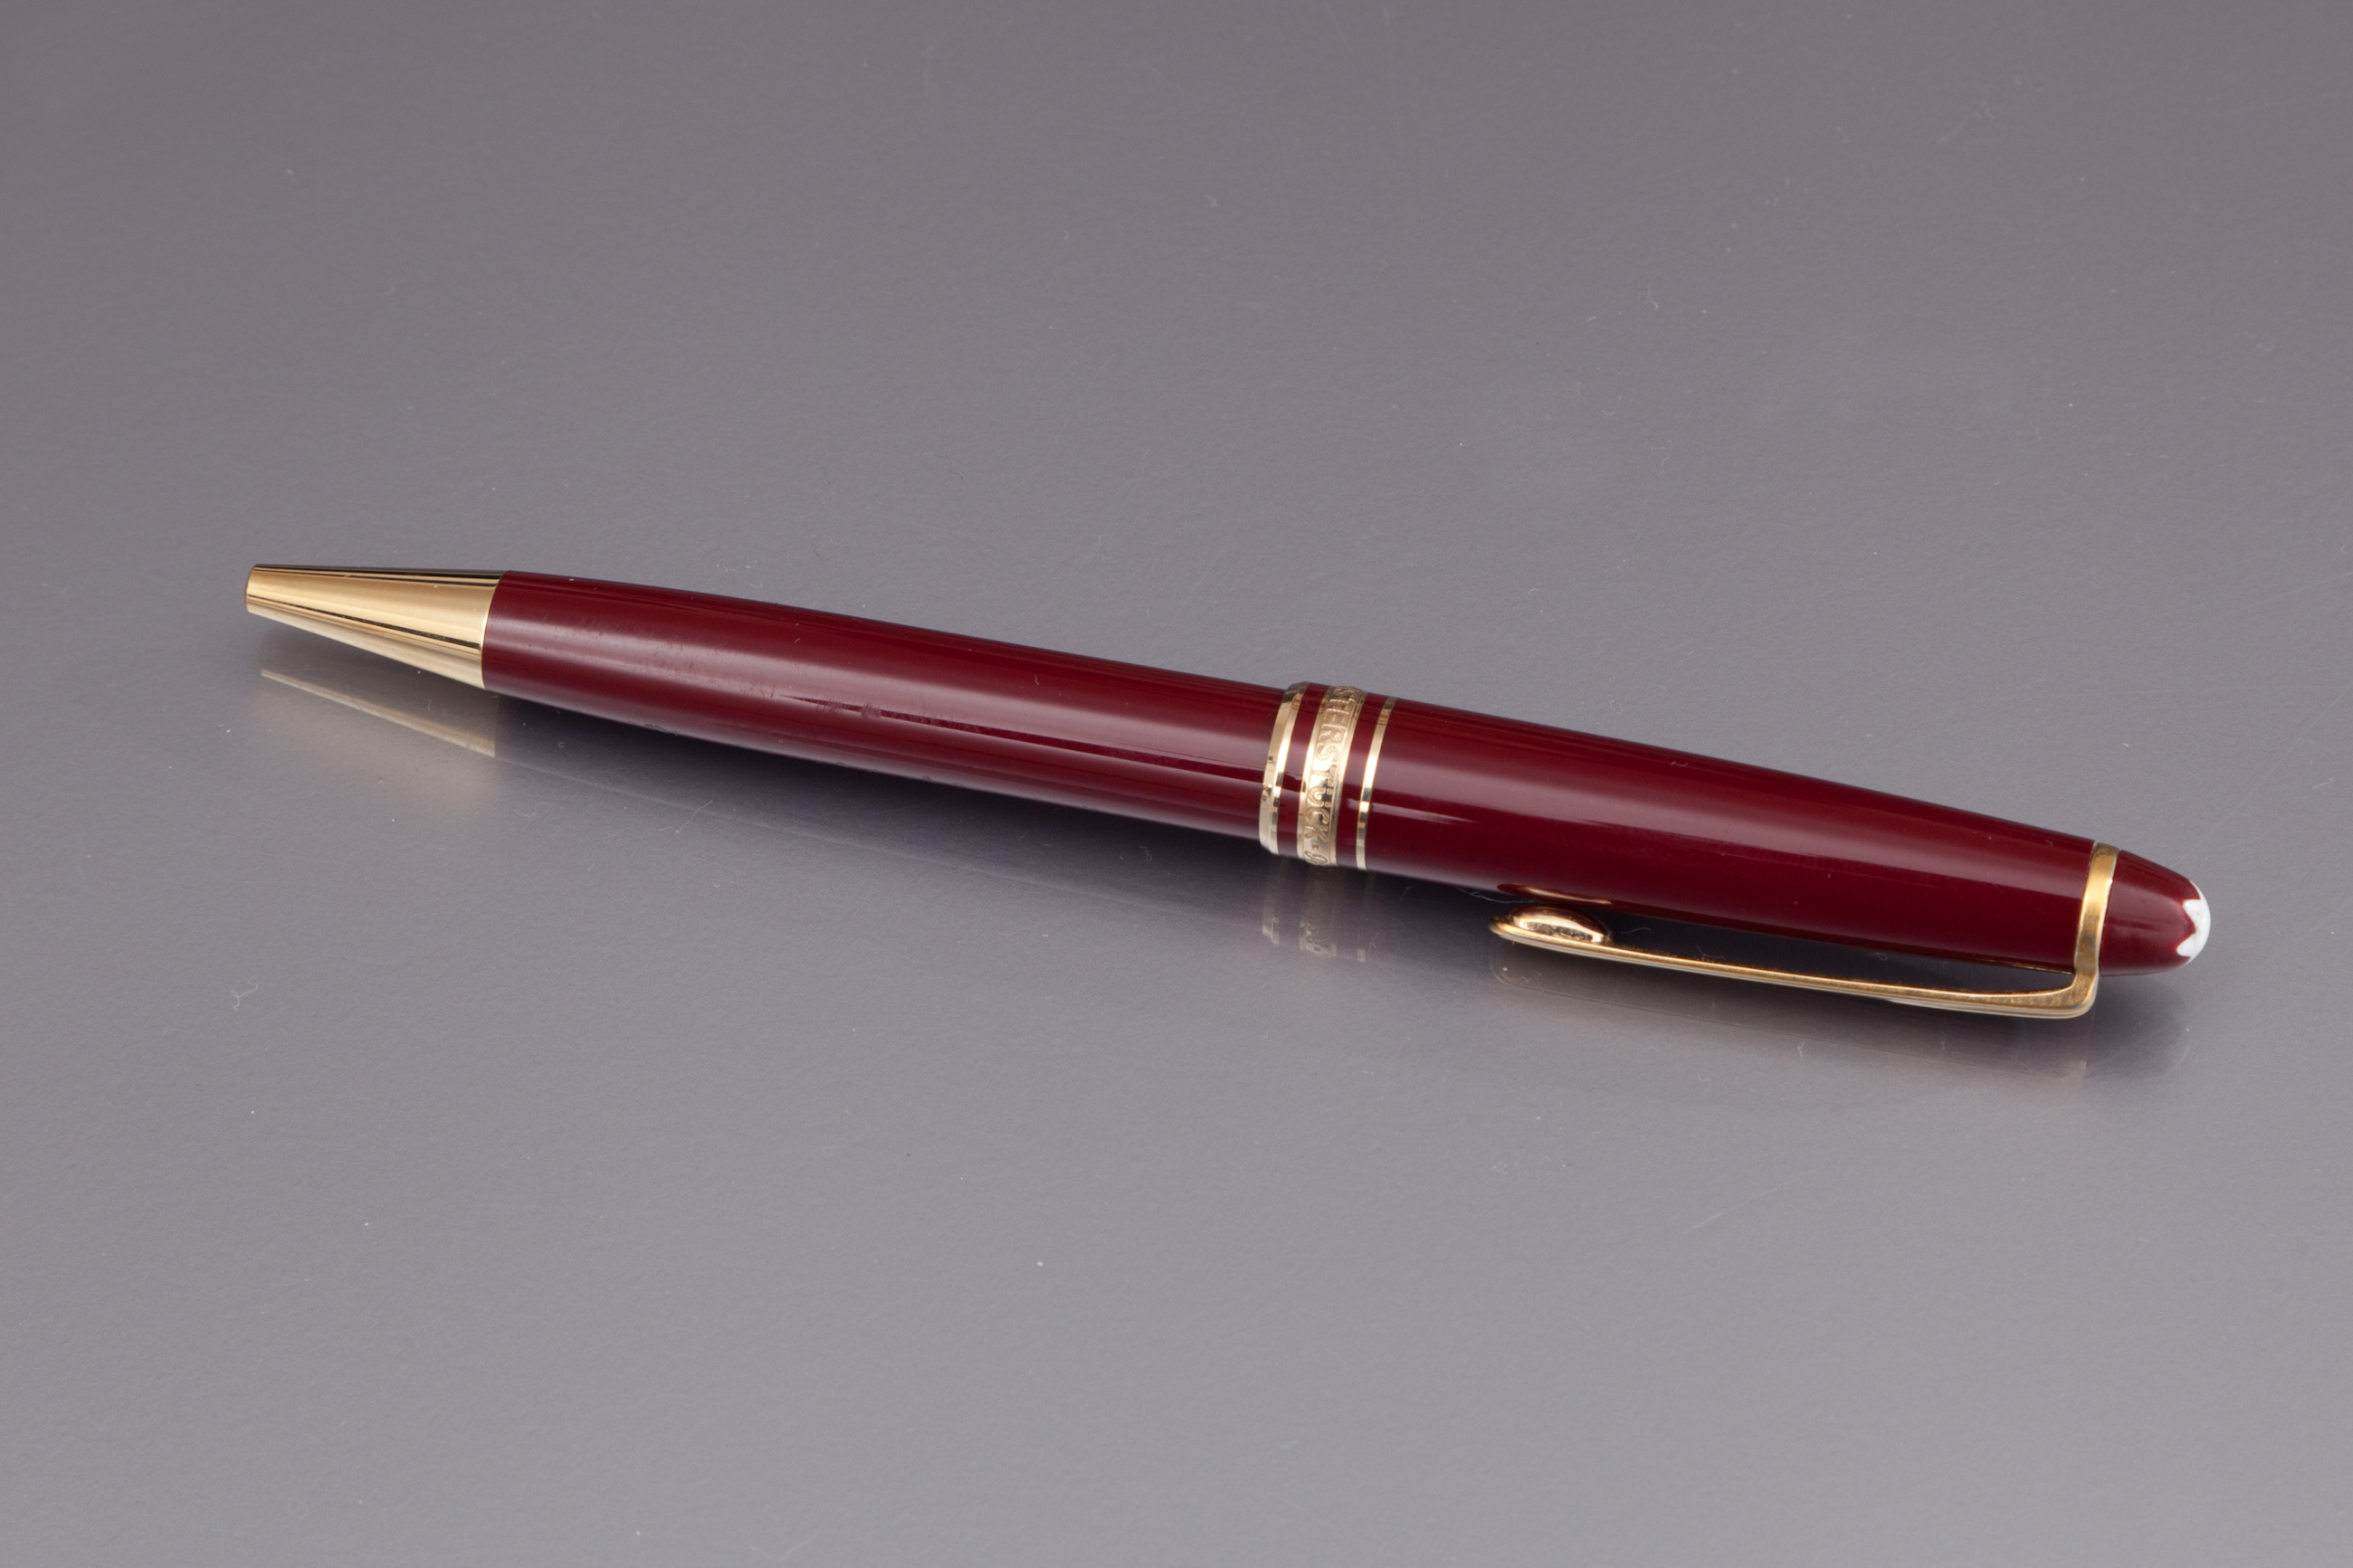 stylo bille mont blanc prix